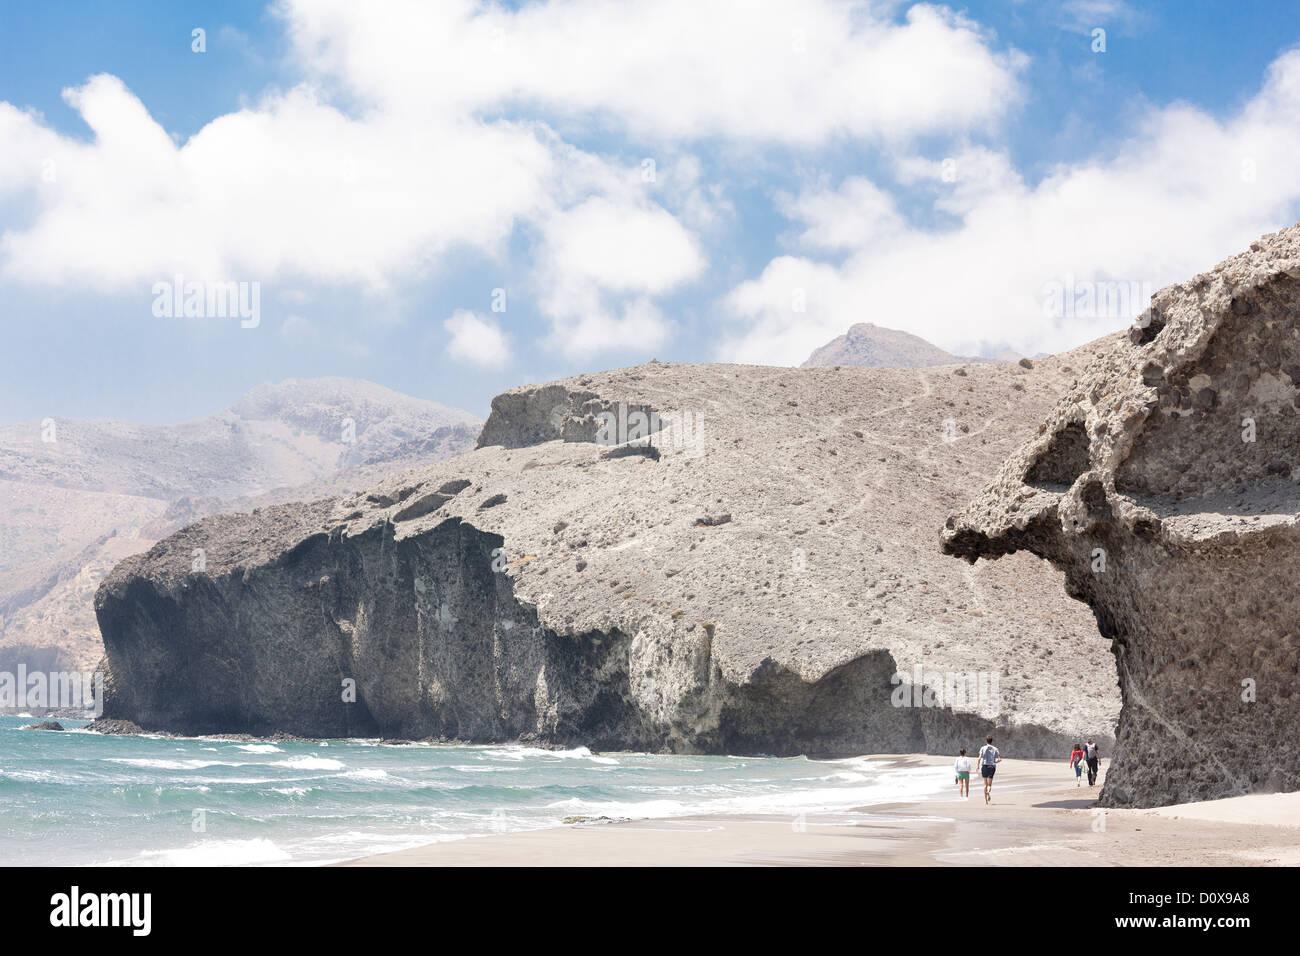 playa-de-mnsul-monsul-beach-cabo-de-gata-almeria-spain-D0X9A8.jpg